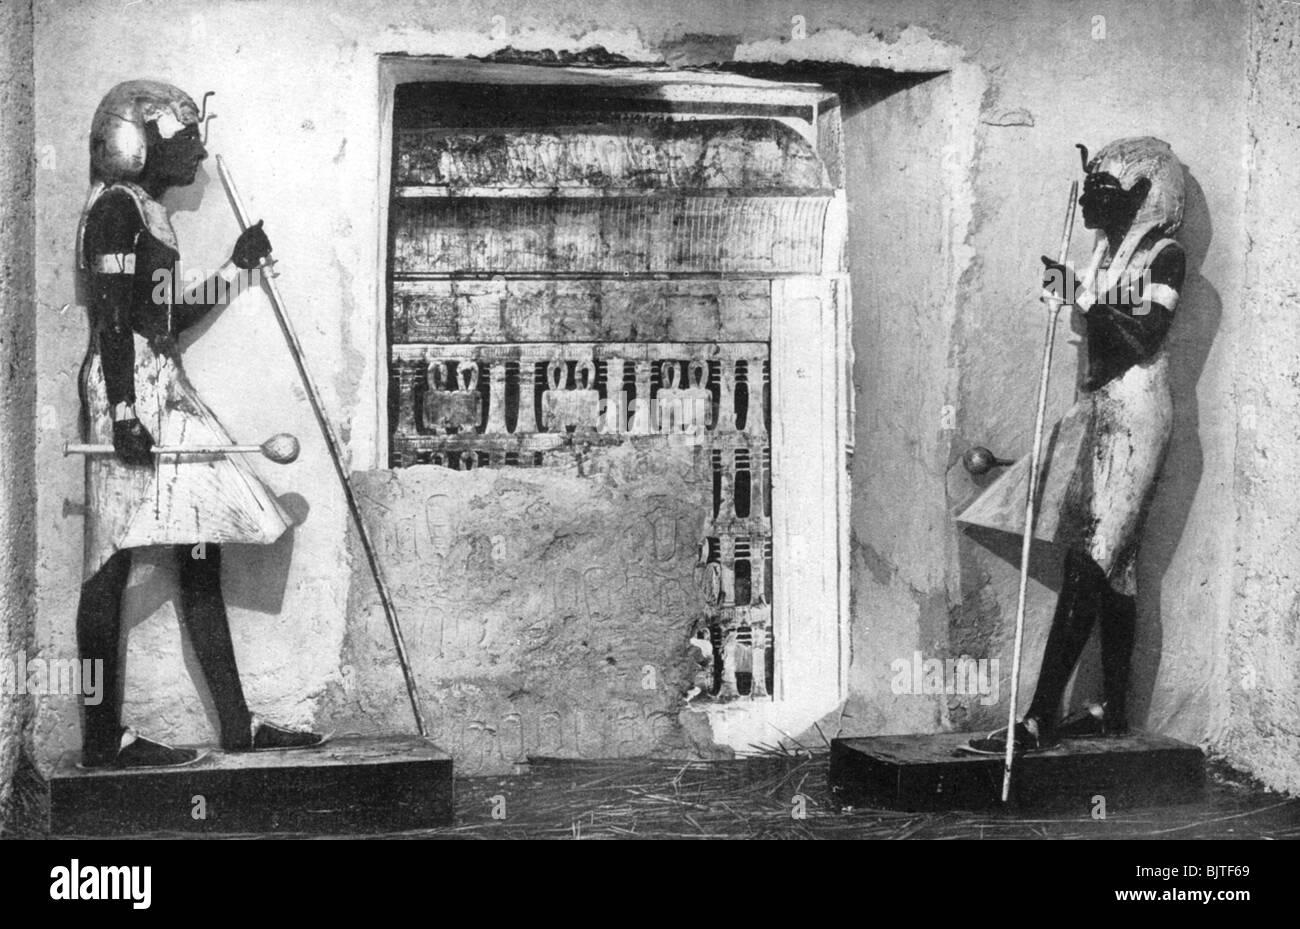 The first glimpse of Tutankhamun's tomb, Egypt, 1933-1934. - Stock Image